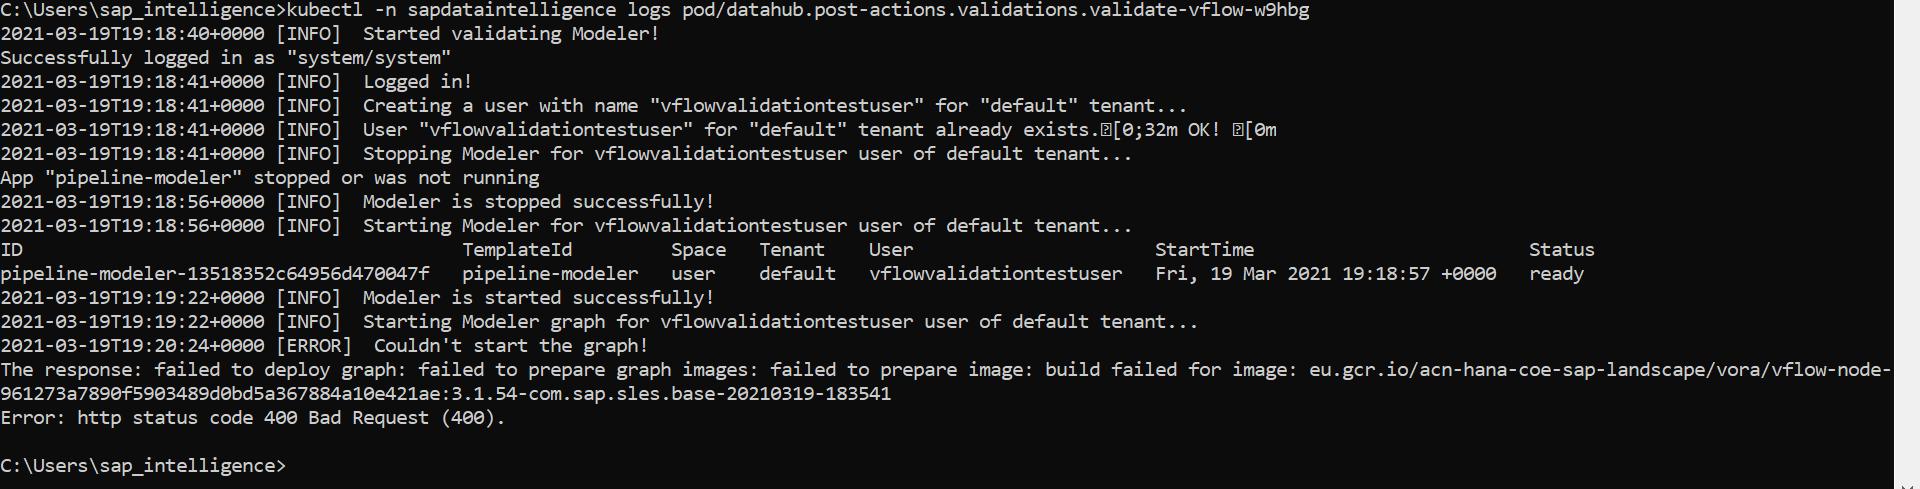 pod/datahub.post-actions.validations.validate-vflow-mmb6z